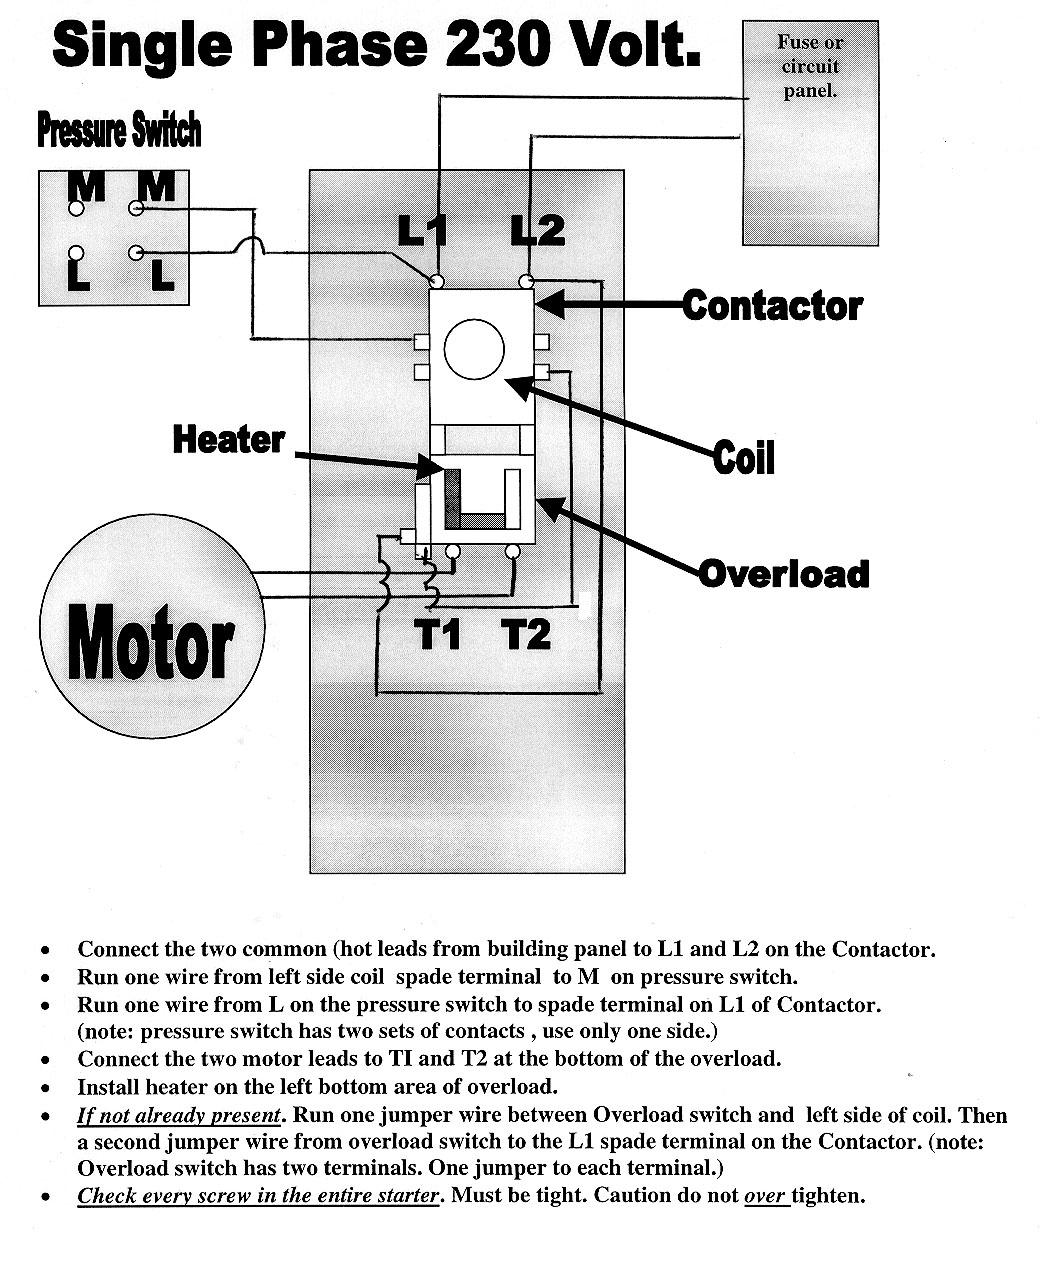 220V Single Phase Motor Wiring Diagram | Manual E-Books - 220V Single Phase Motor Wiring Diagram